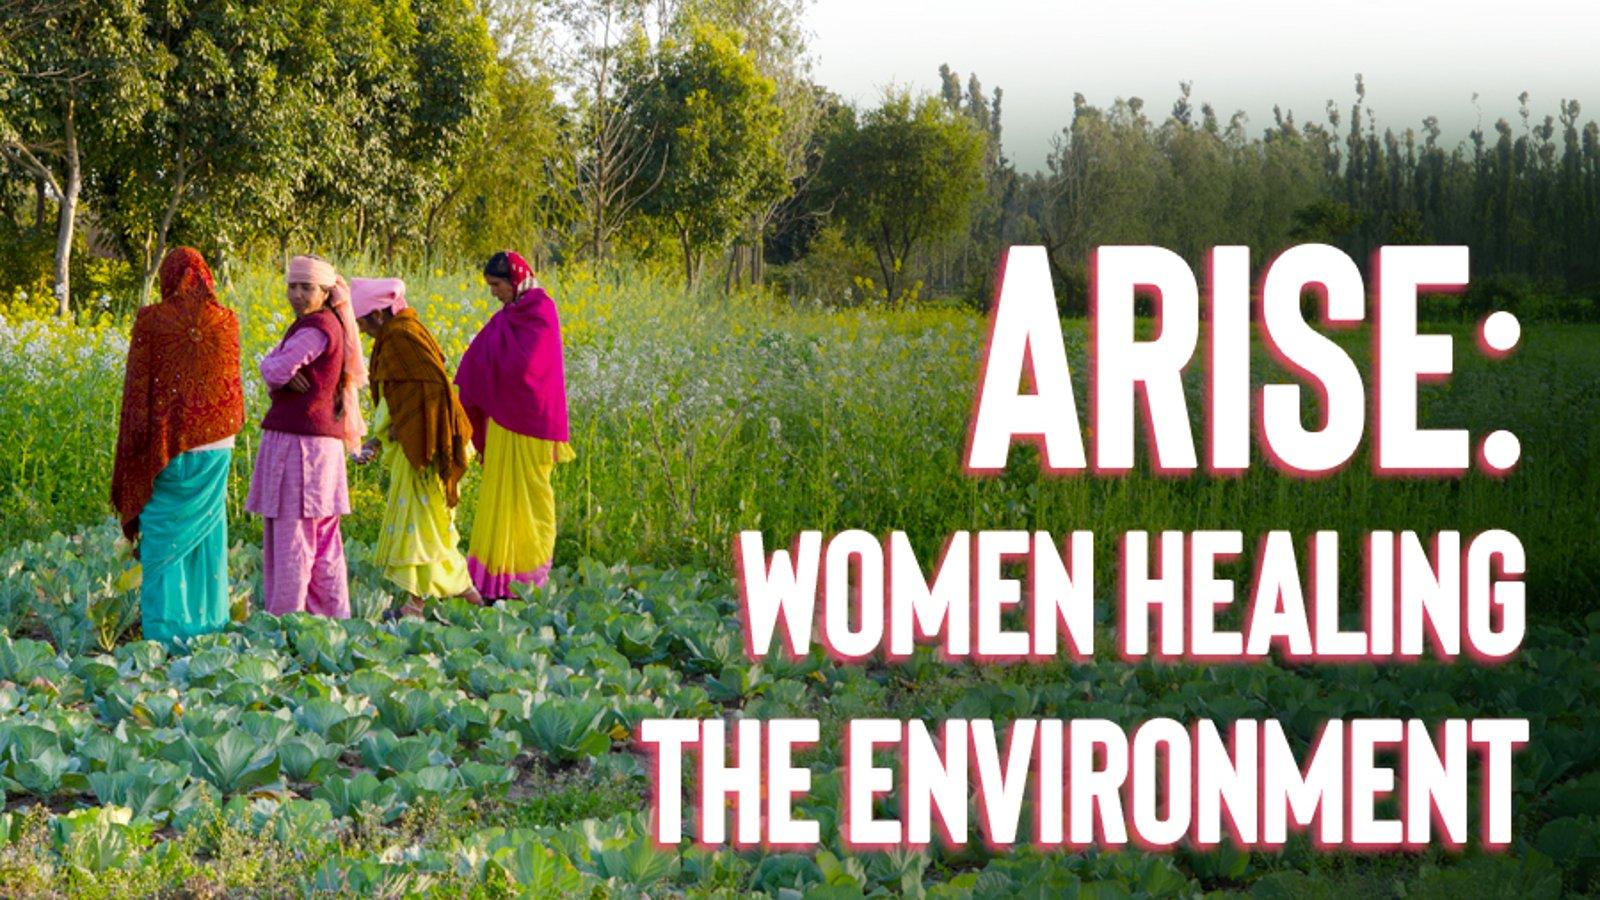 Arise - Women Healing the Environment